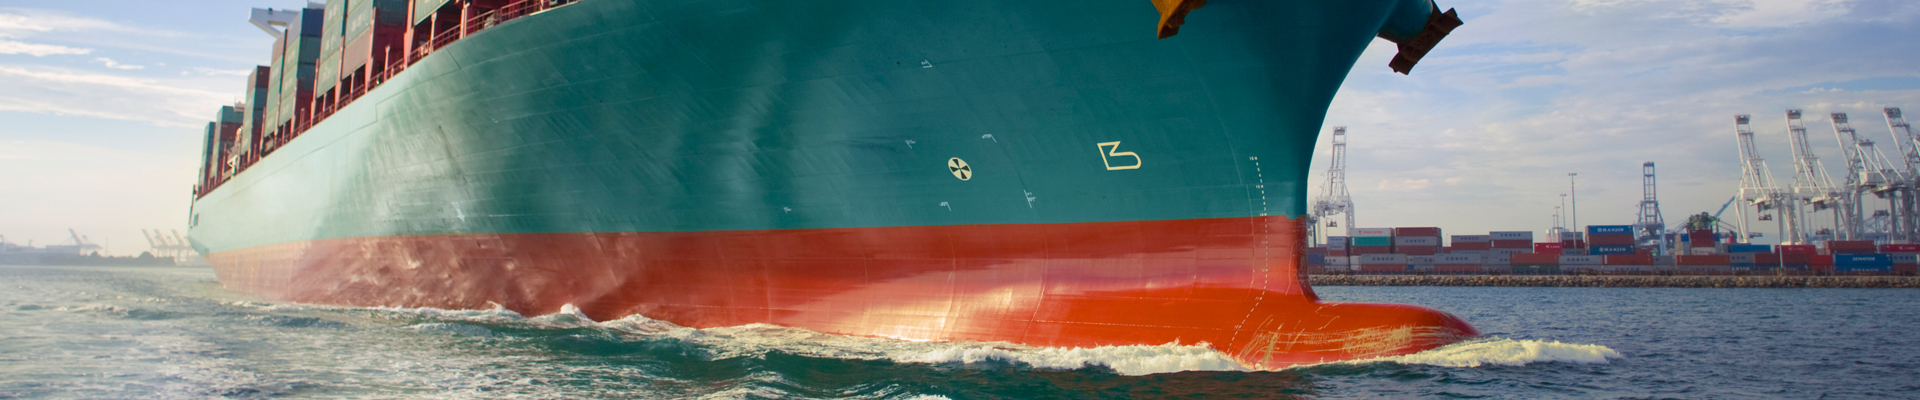 delitek-containership